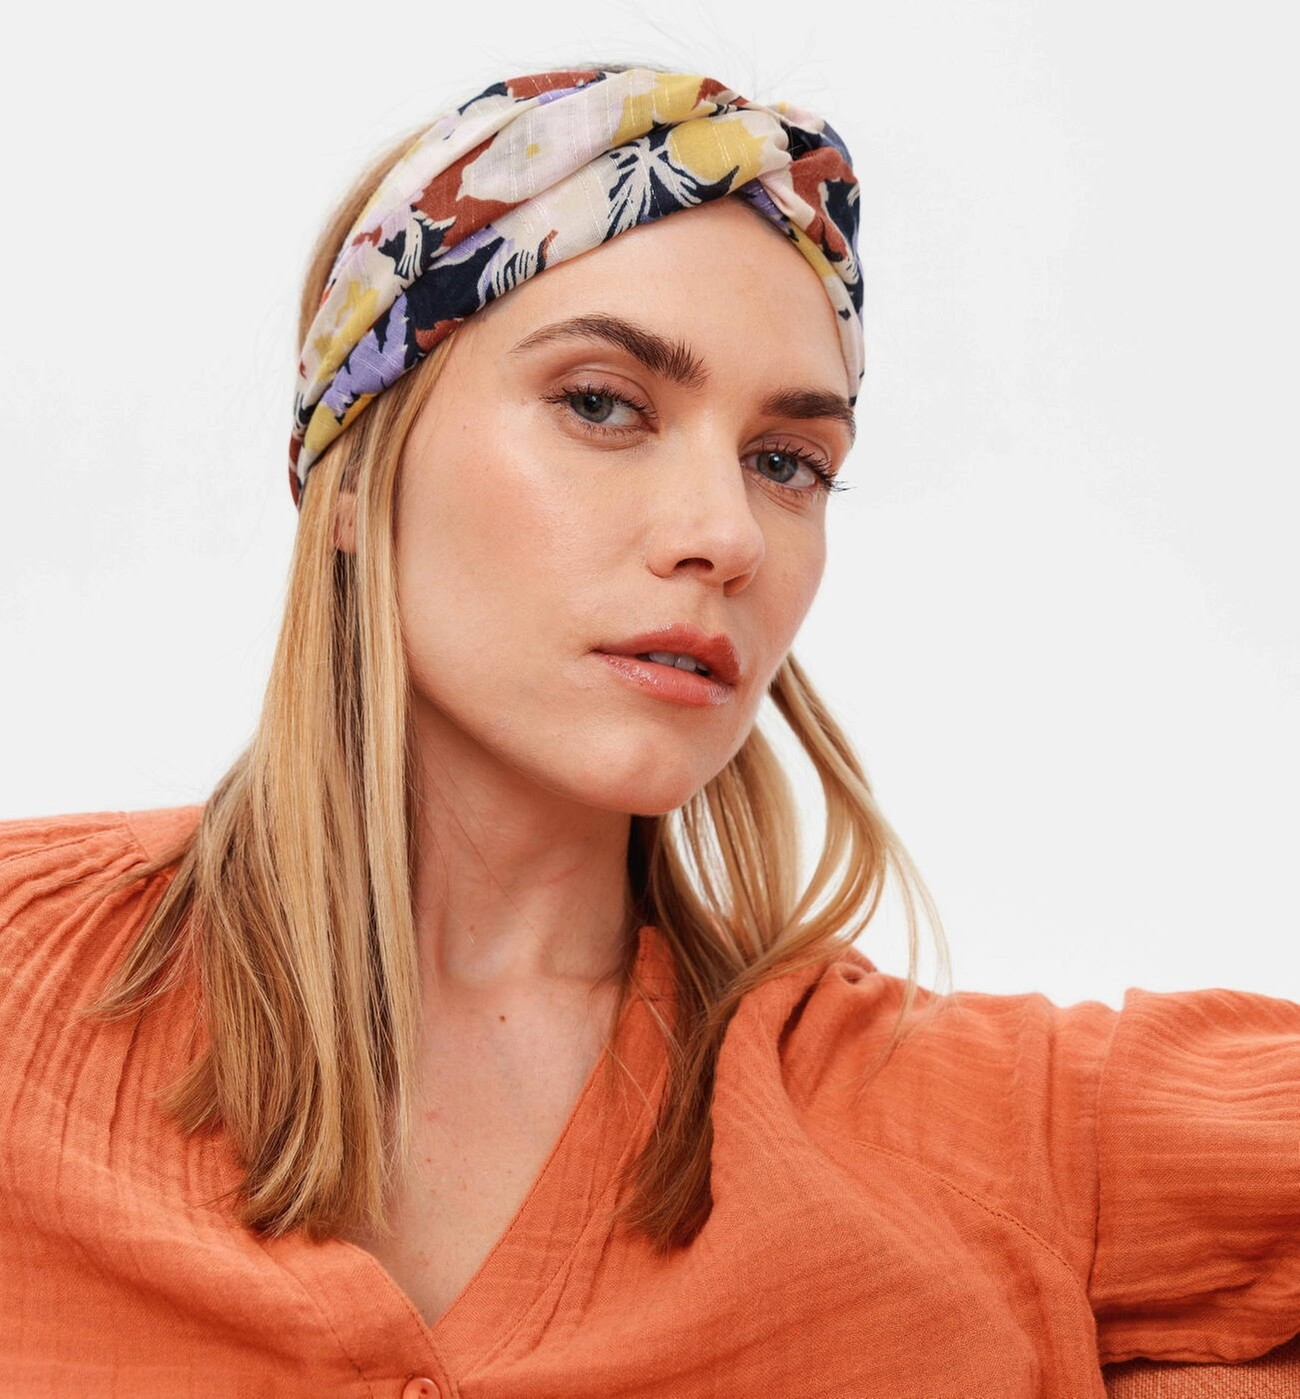 Headband en polyester imprimé fleuri, Promod, 12,95€.